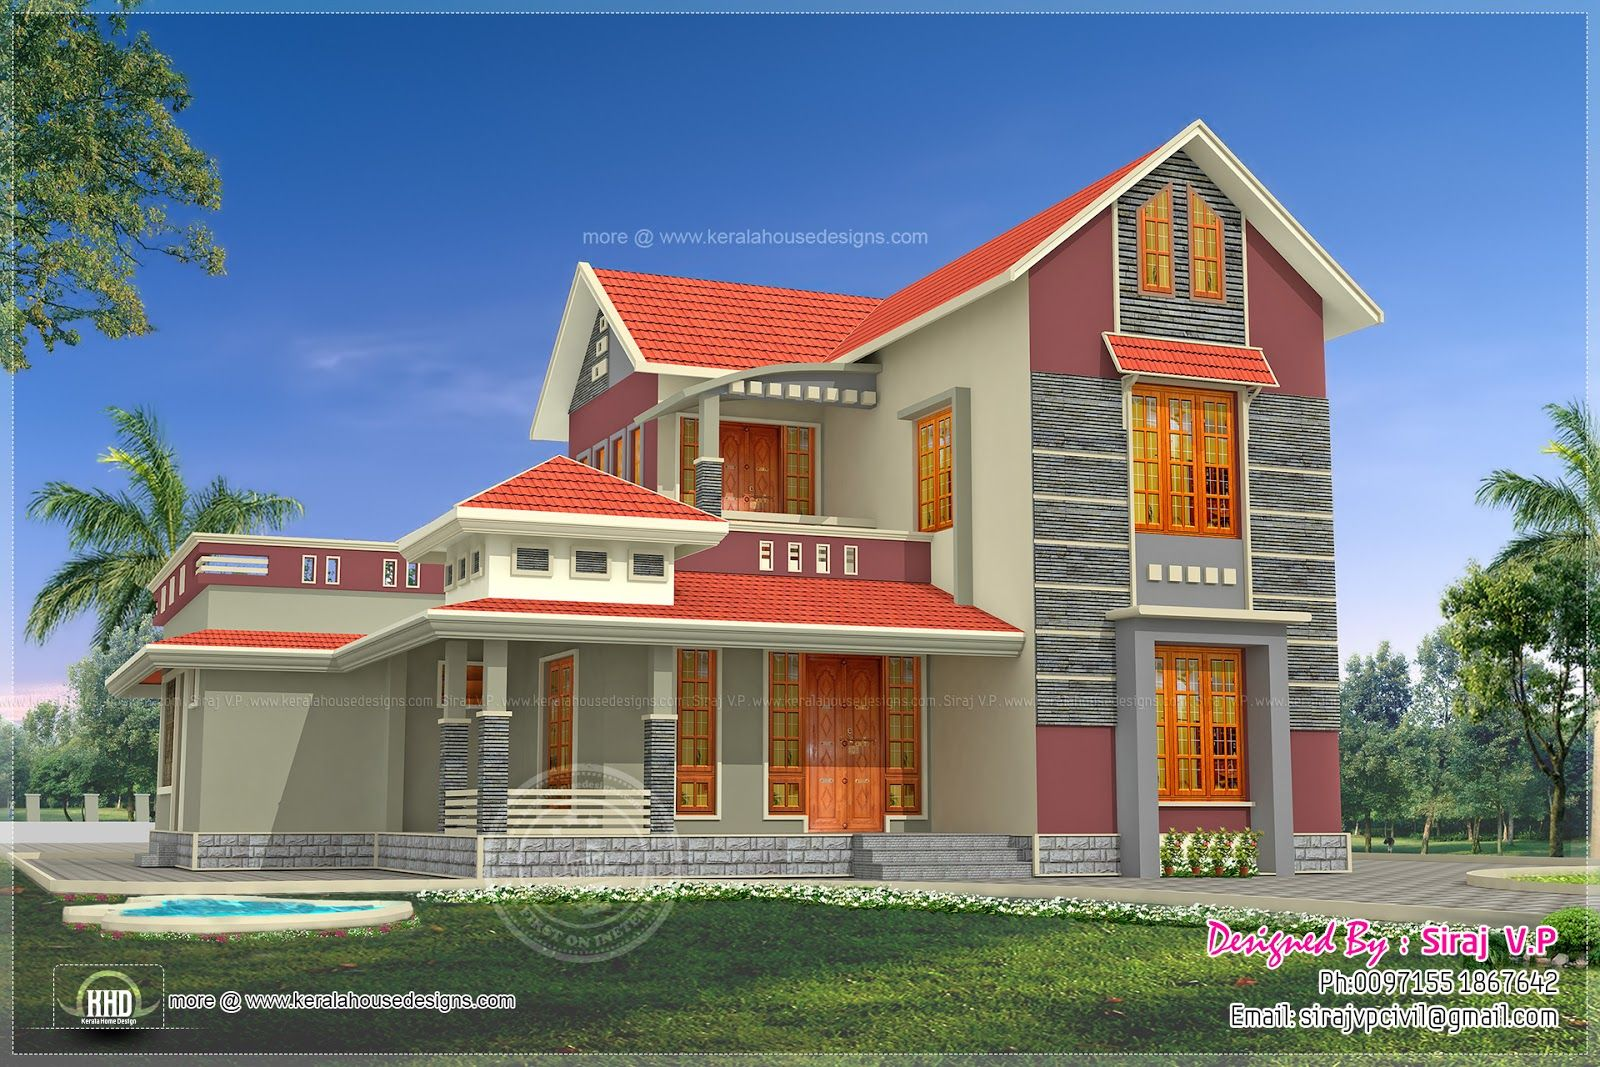 Beautiful 4 bedroom villa elevation in 2000 sq ft indian for Indian villa designs exterior photos